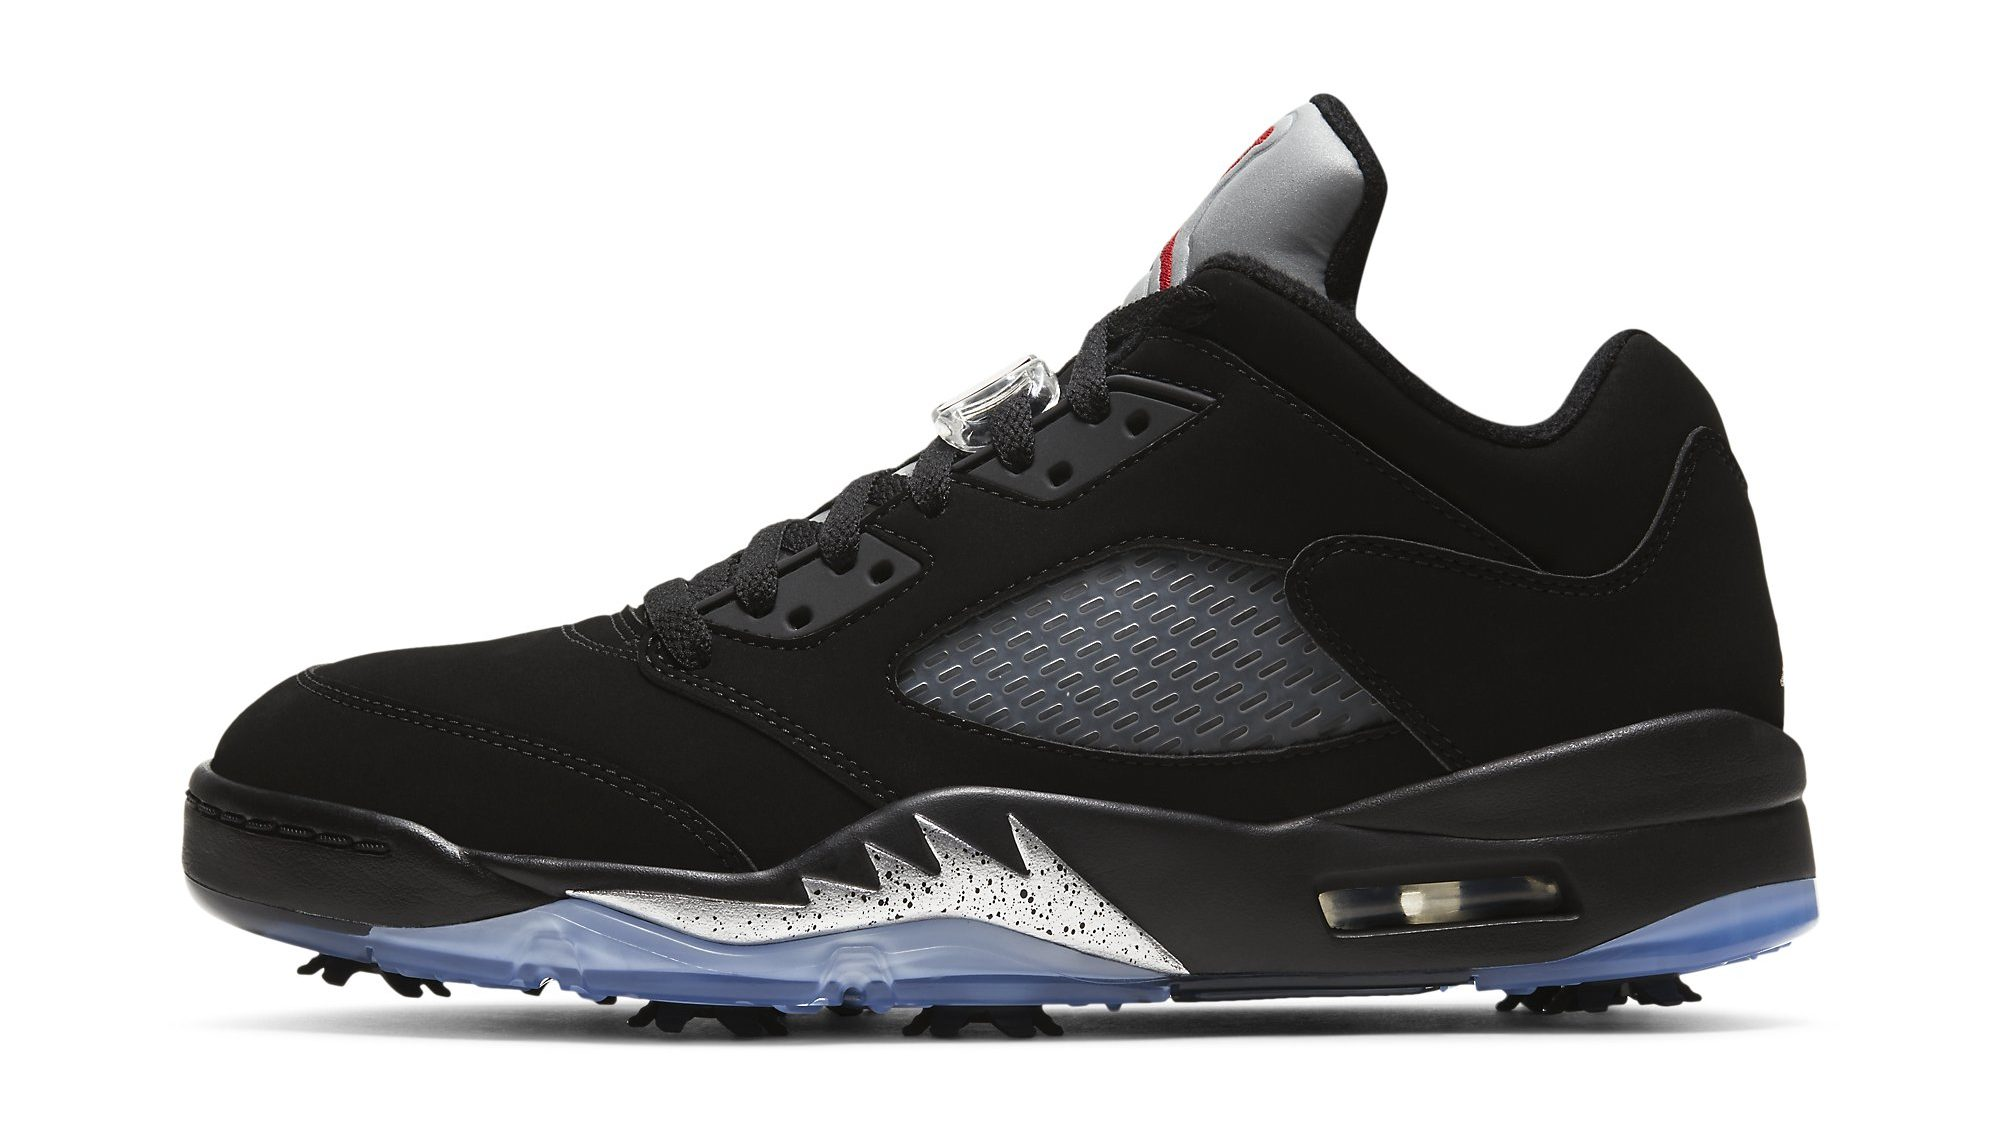 Air Jordan 5 Golf 'Black Metallic